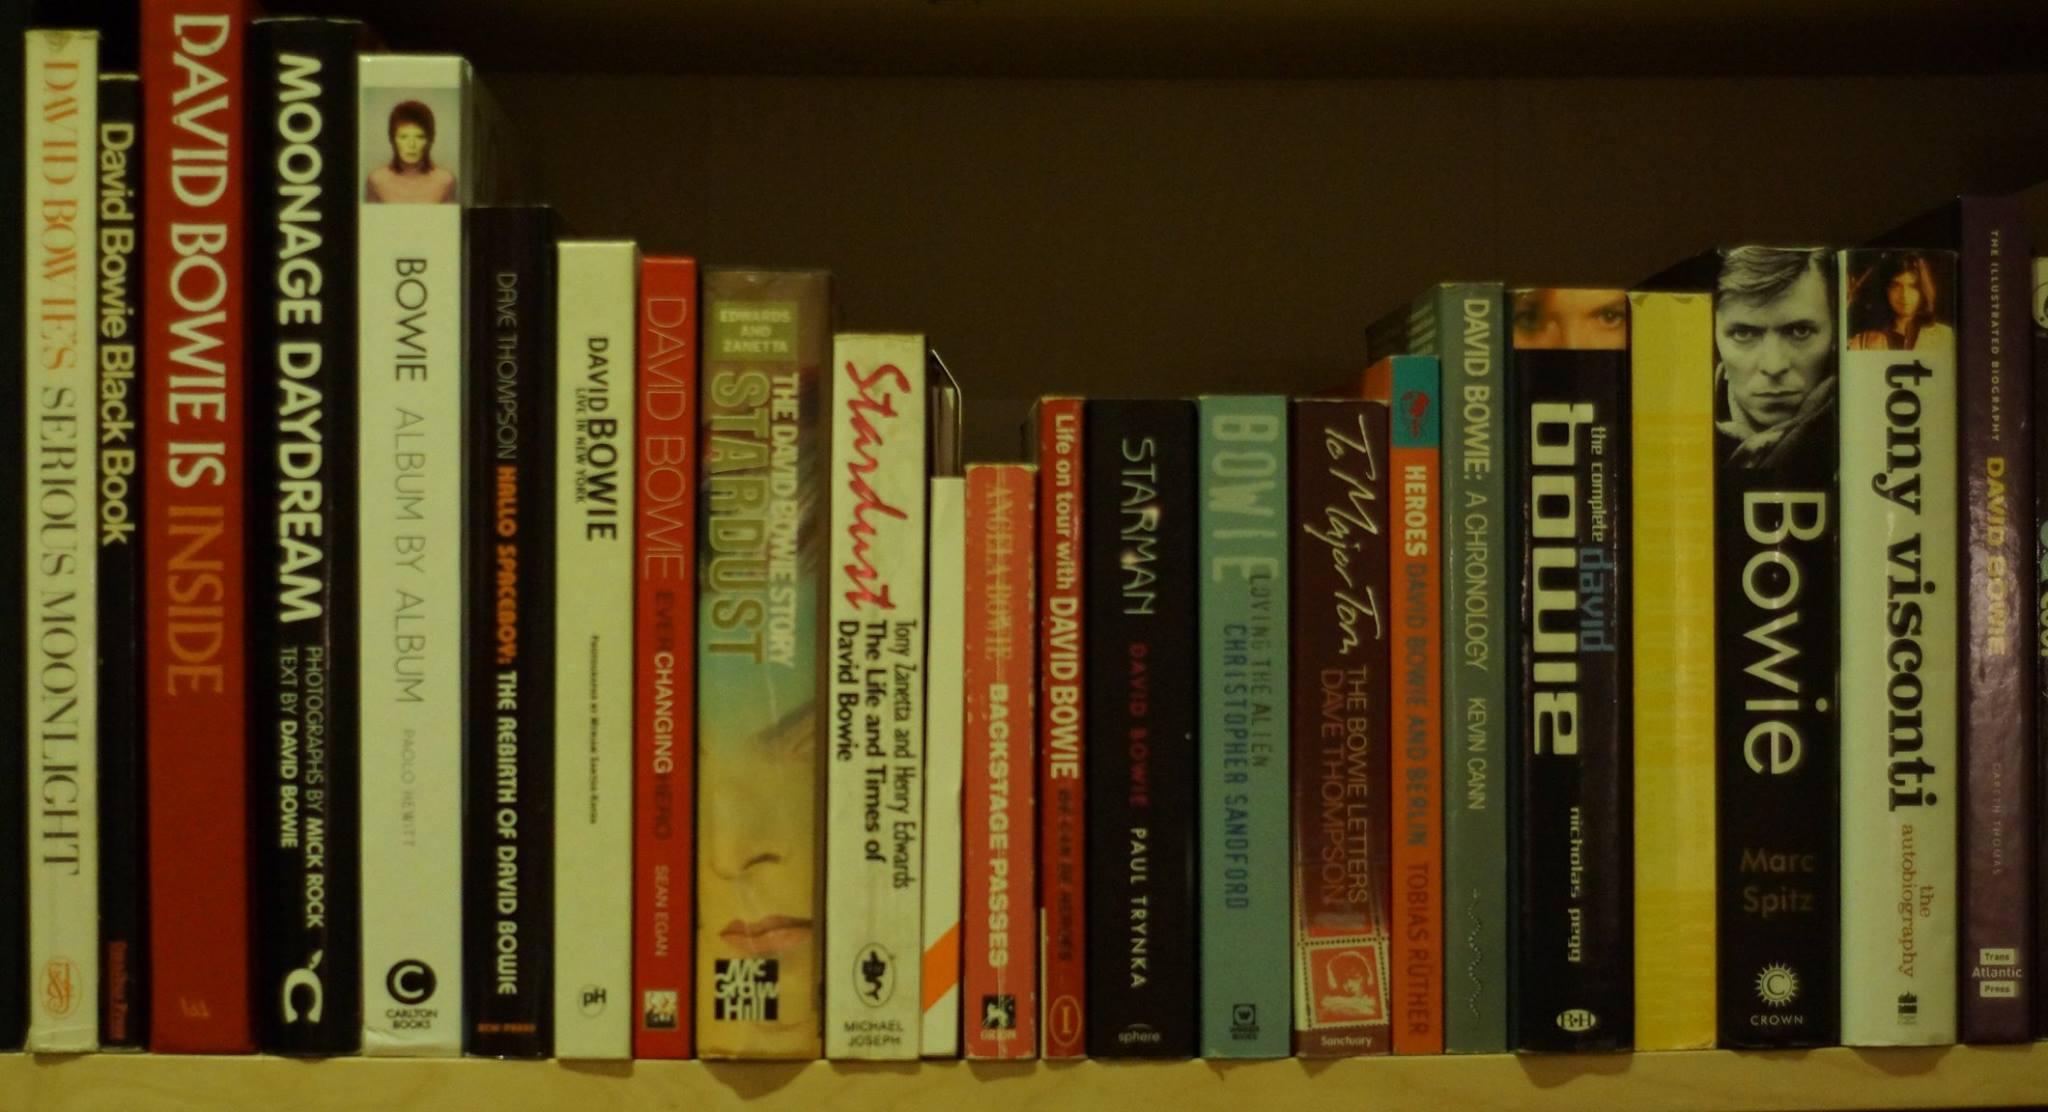 Daniel's David Bowie books collection